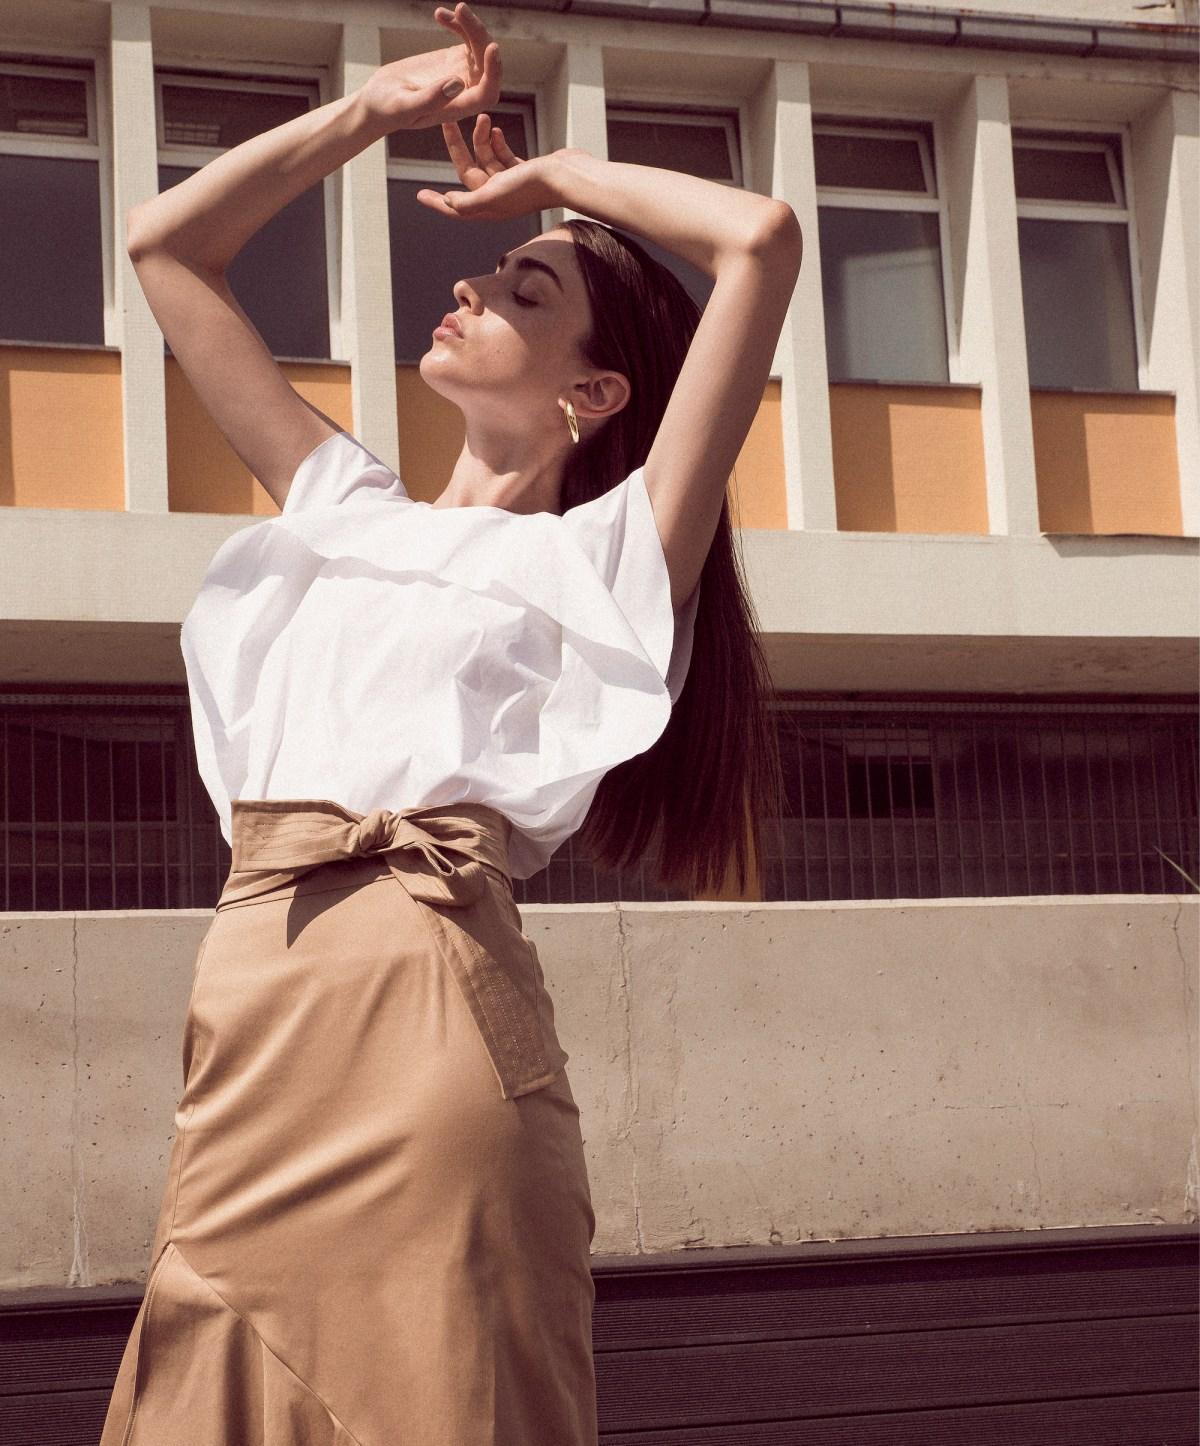 Dan Kic by Marko Vulevic and Vladimir Ilic for Harper's Bazaar Serbia